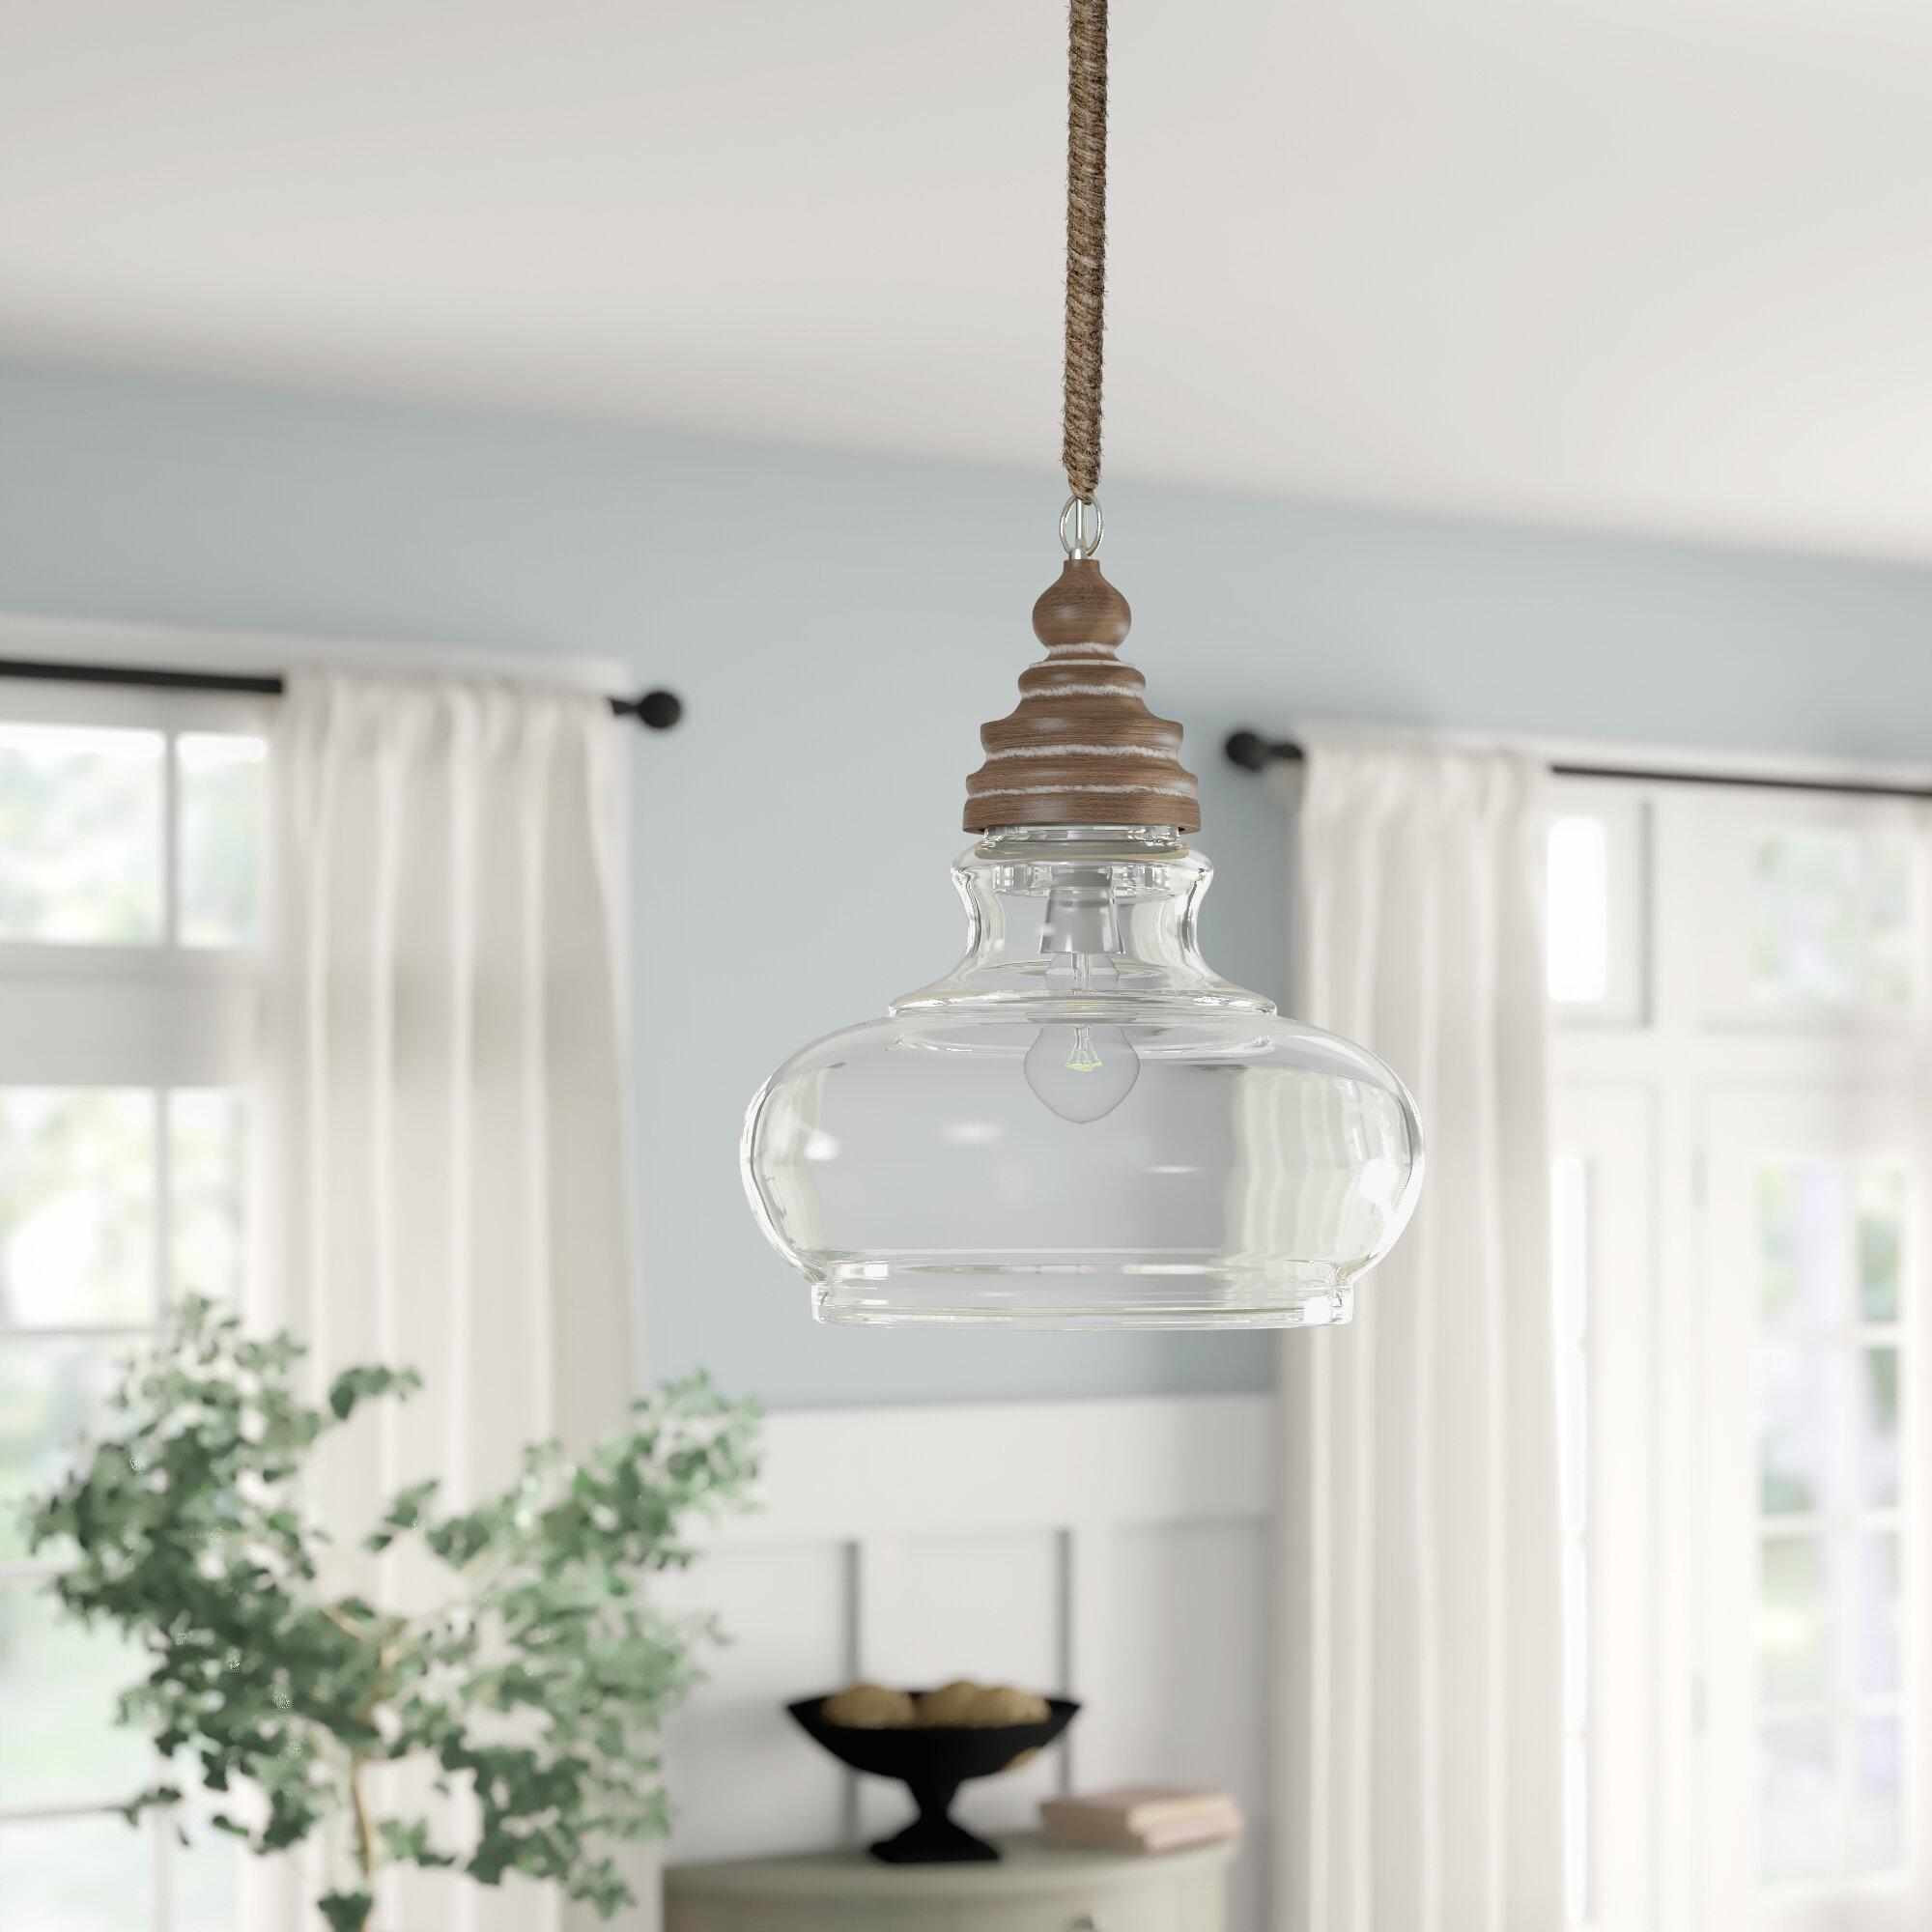 Maelle 1 Light Bell Pendant Throughout Akakios 1 Light Single Bell Pendants (Image 18 of 30)